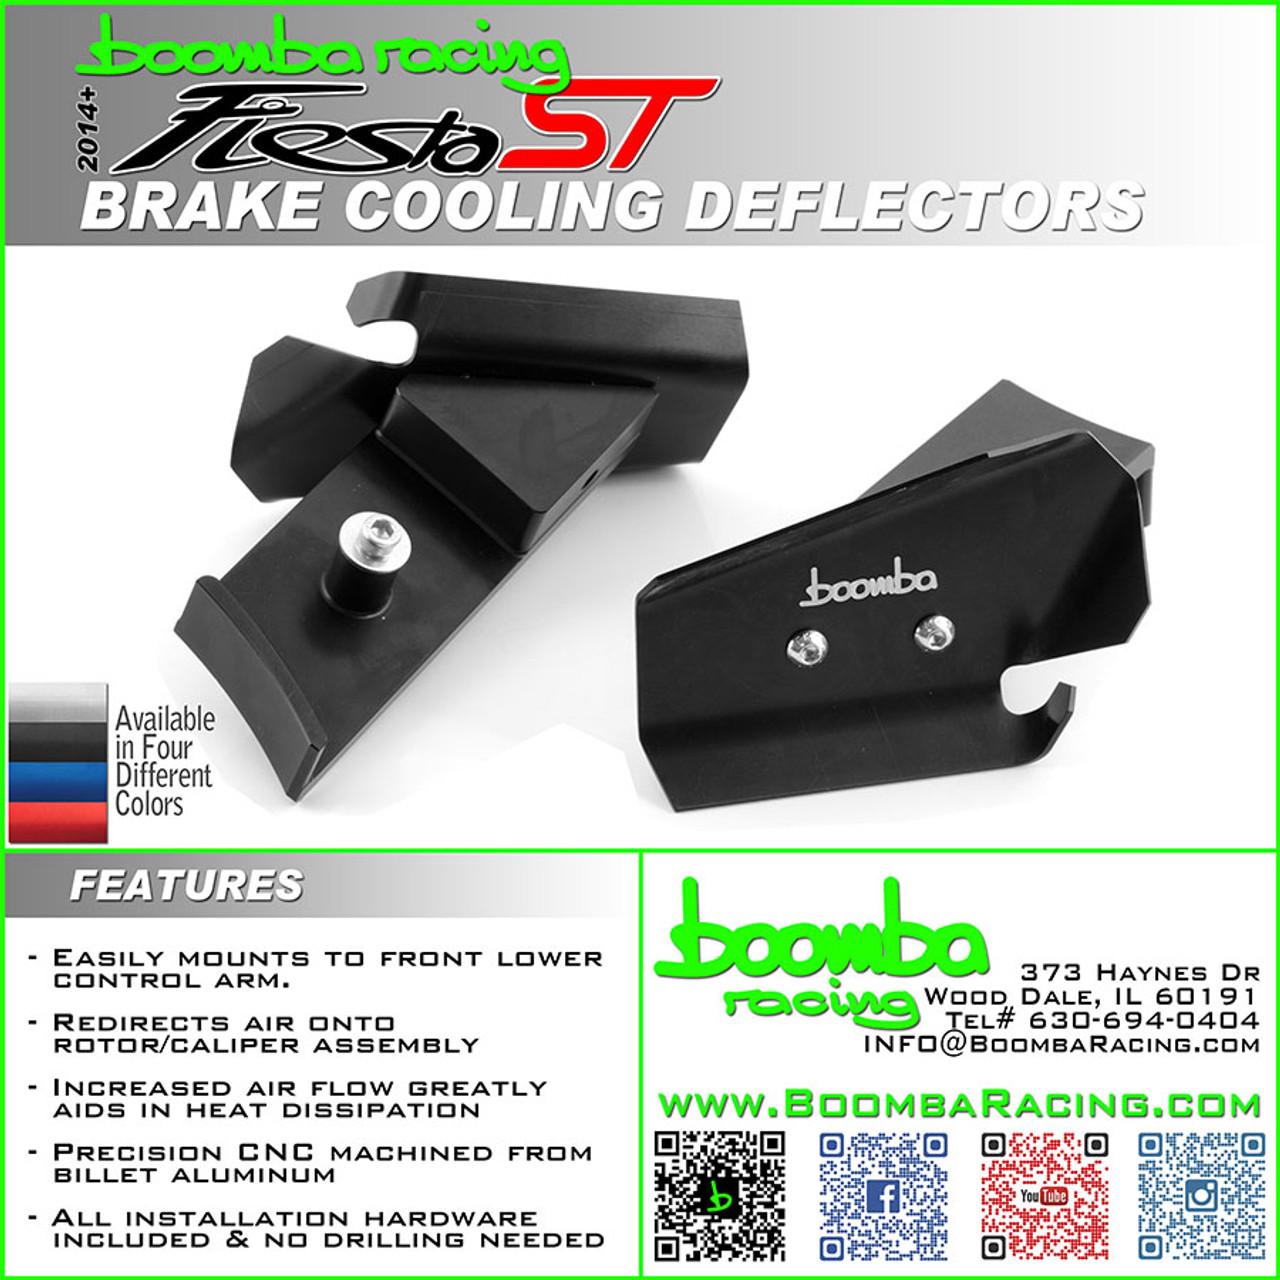 2014 + Fiesta ST Brake Cooling Deflector